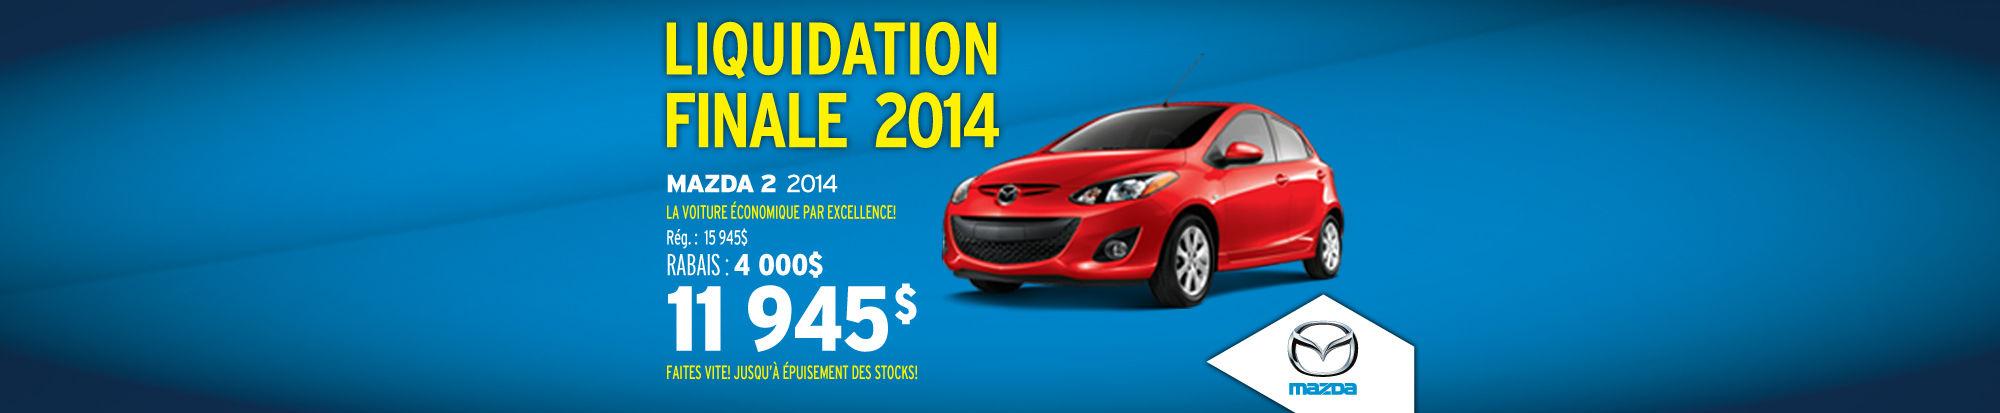 Mazda2 2014 liquidation